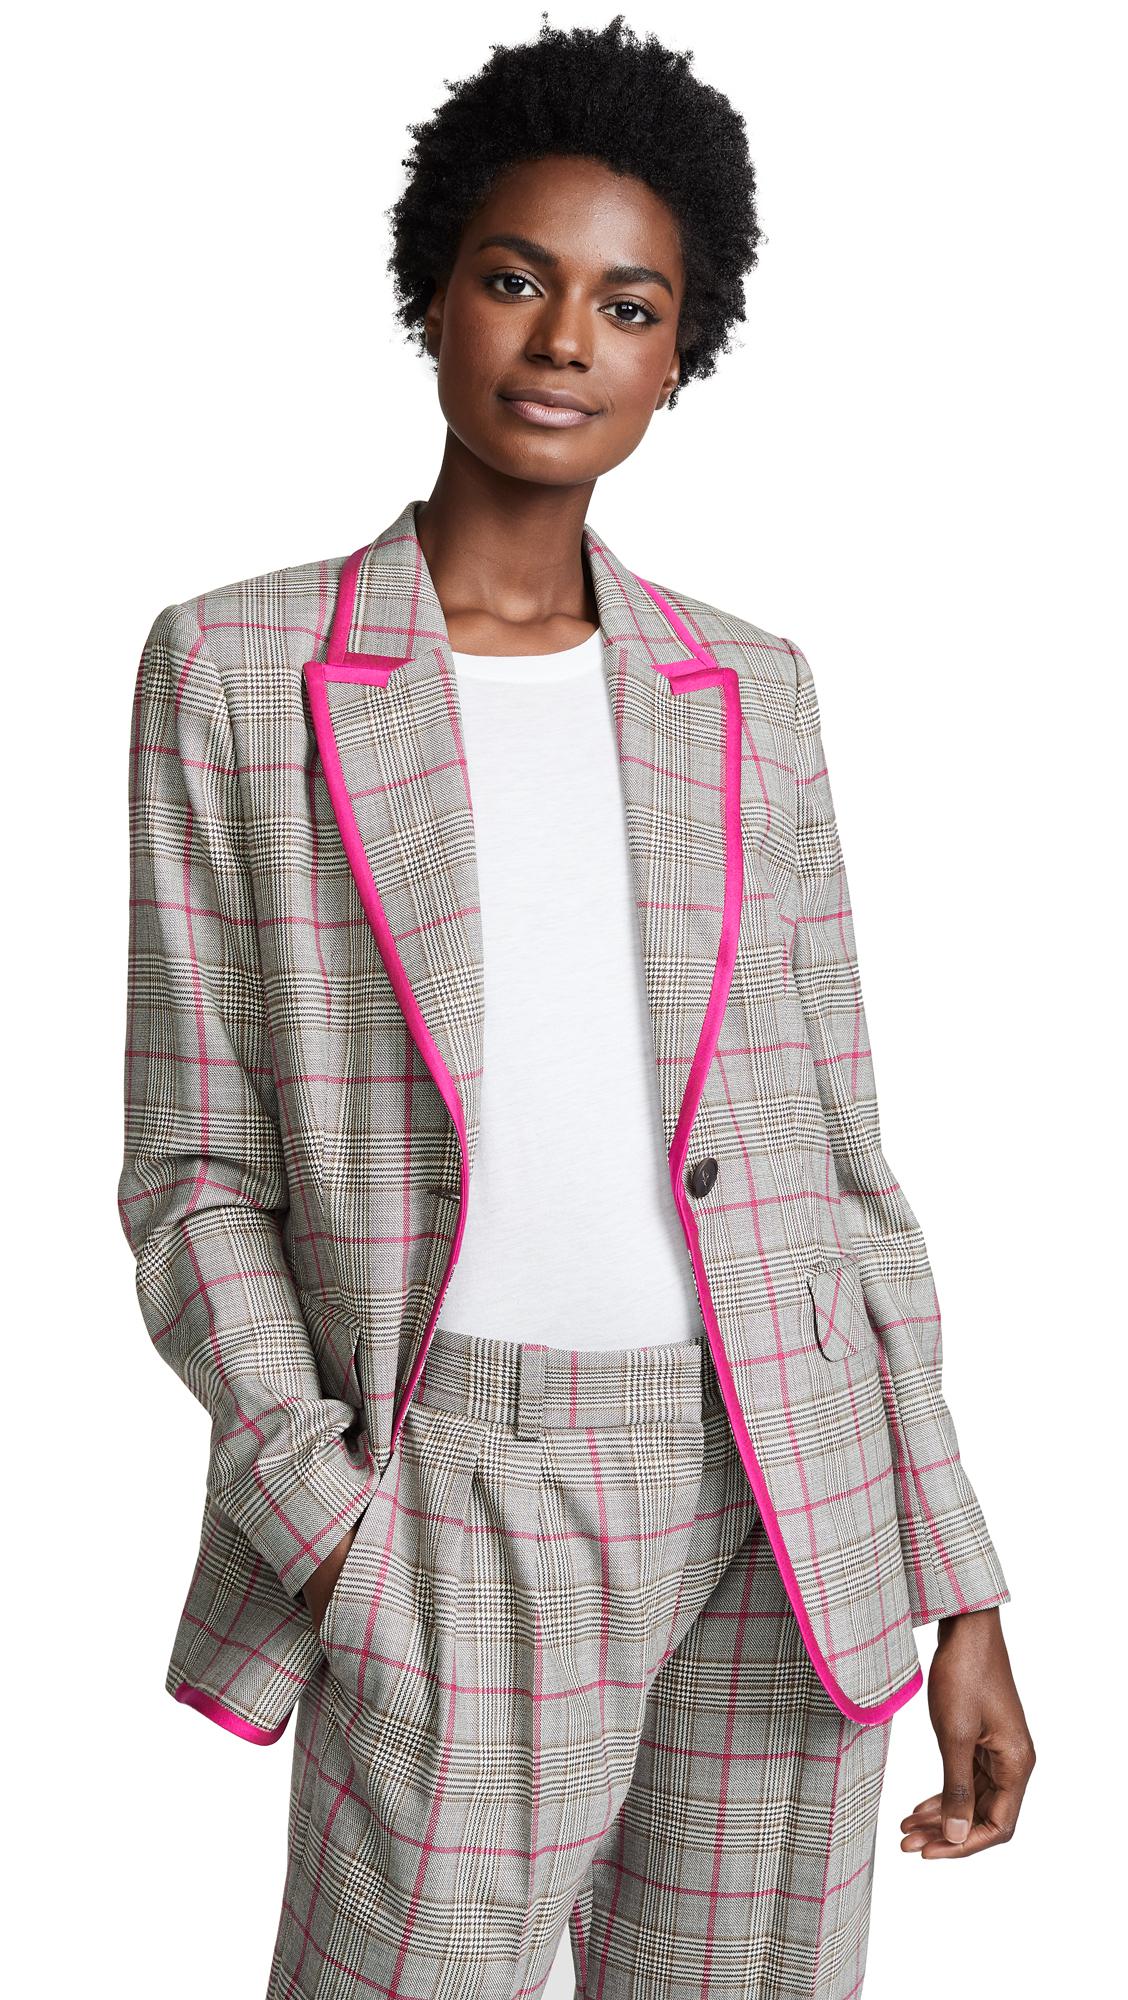 PALLAS Delacroix Contrast Trim Blazer in Pink Plaid